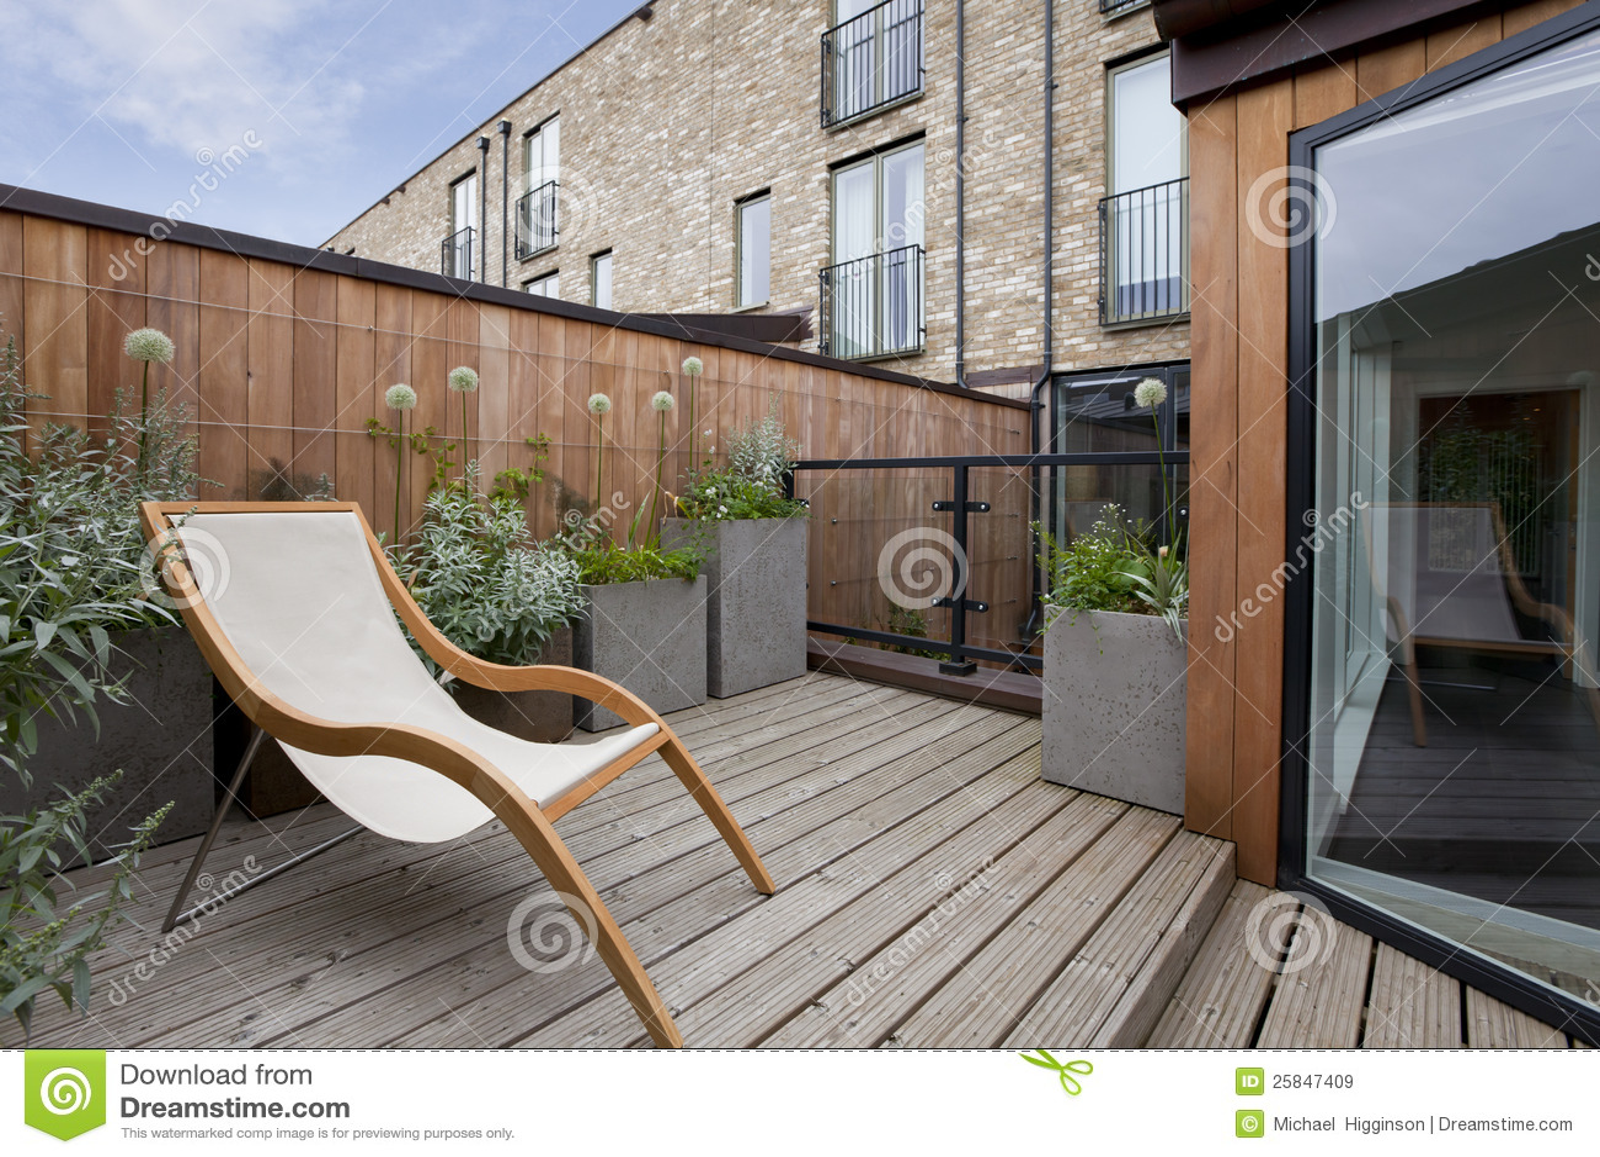 Jardin Urbain De Balcon Images libres de